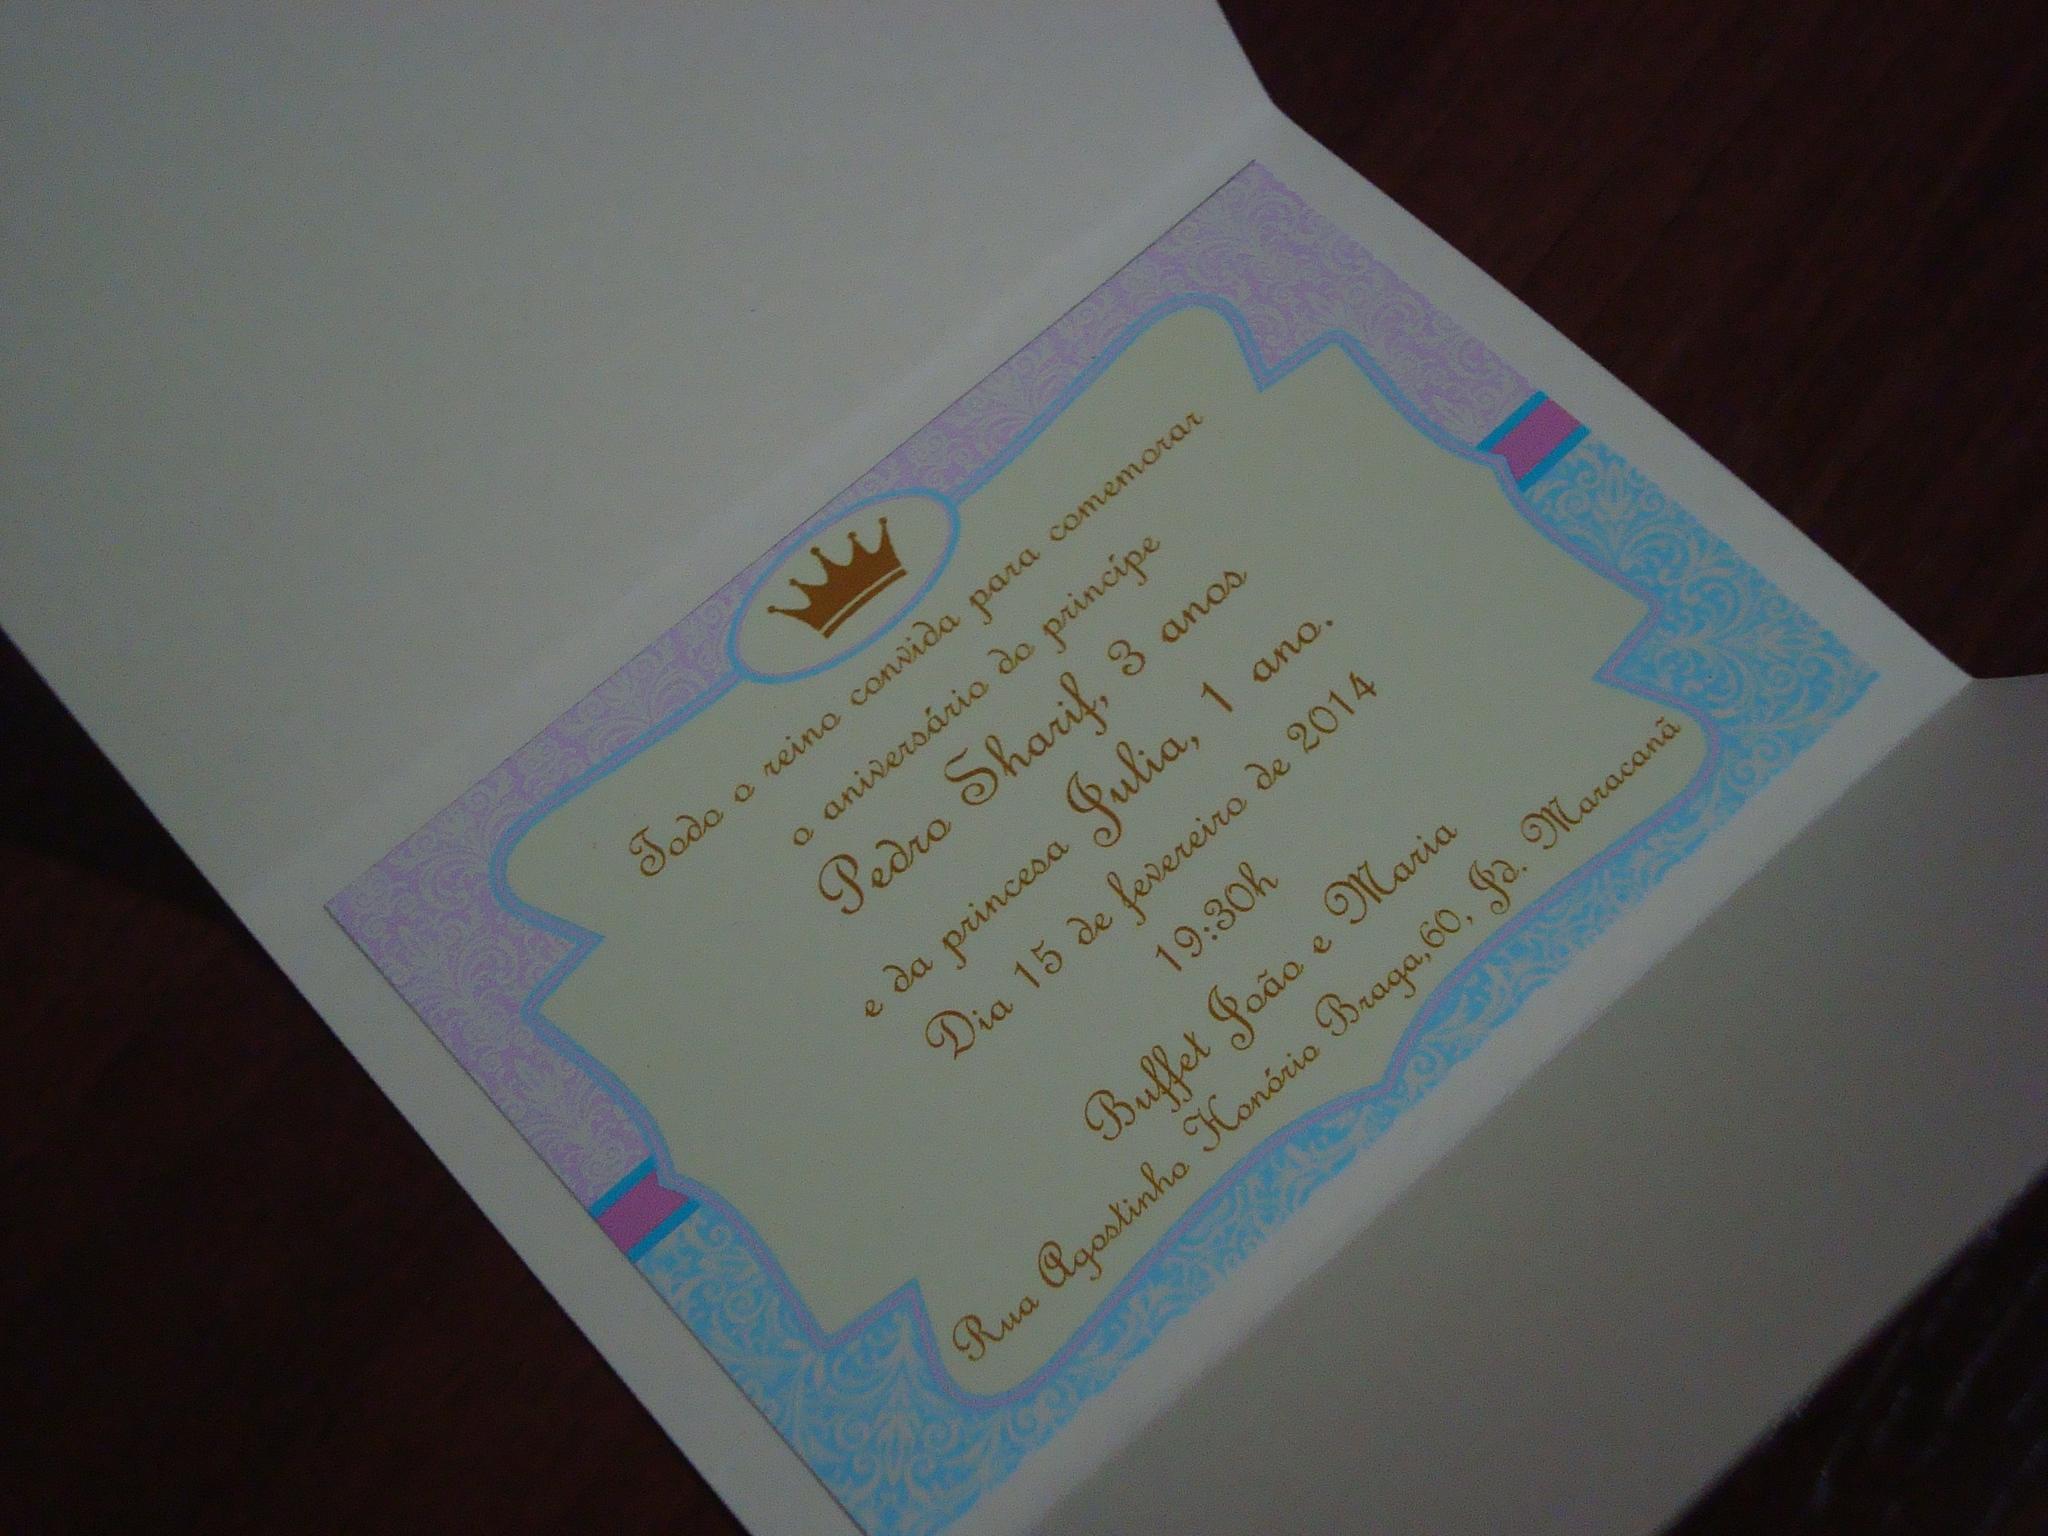 Preferência Convite Personalizado Príncipe e Princesa no Elo7 | Fazendoart  ZX71